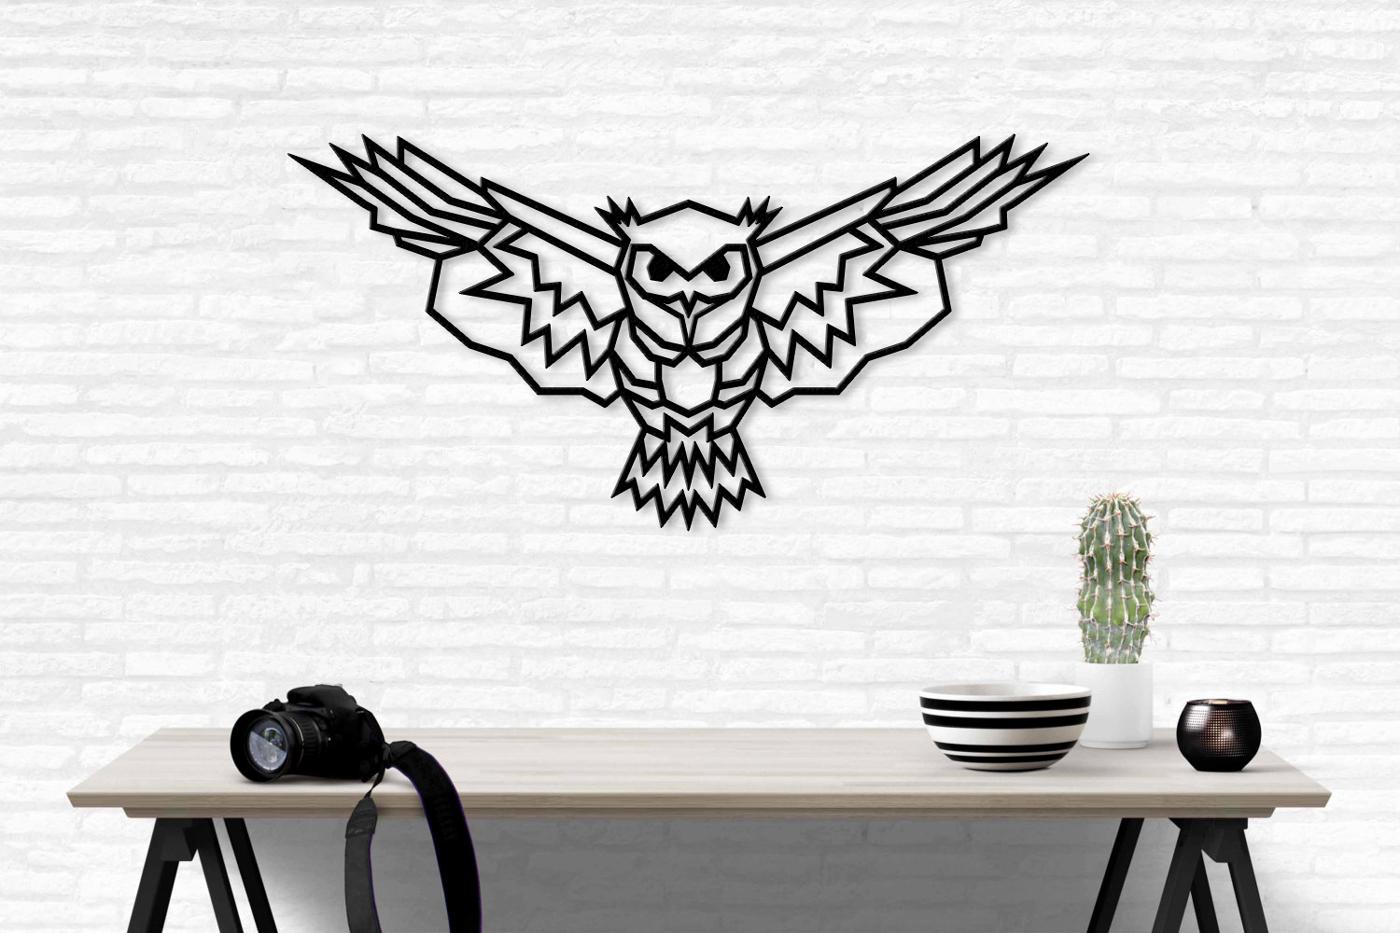 wall decor wall decoration animal decoratin animal model geometric animals pikachu deer tiger owl Pokemon